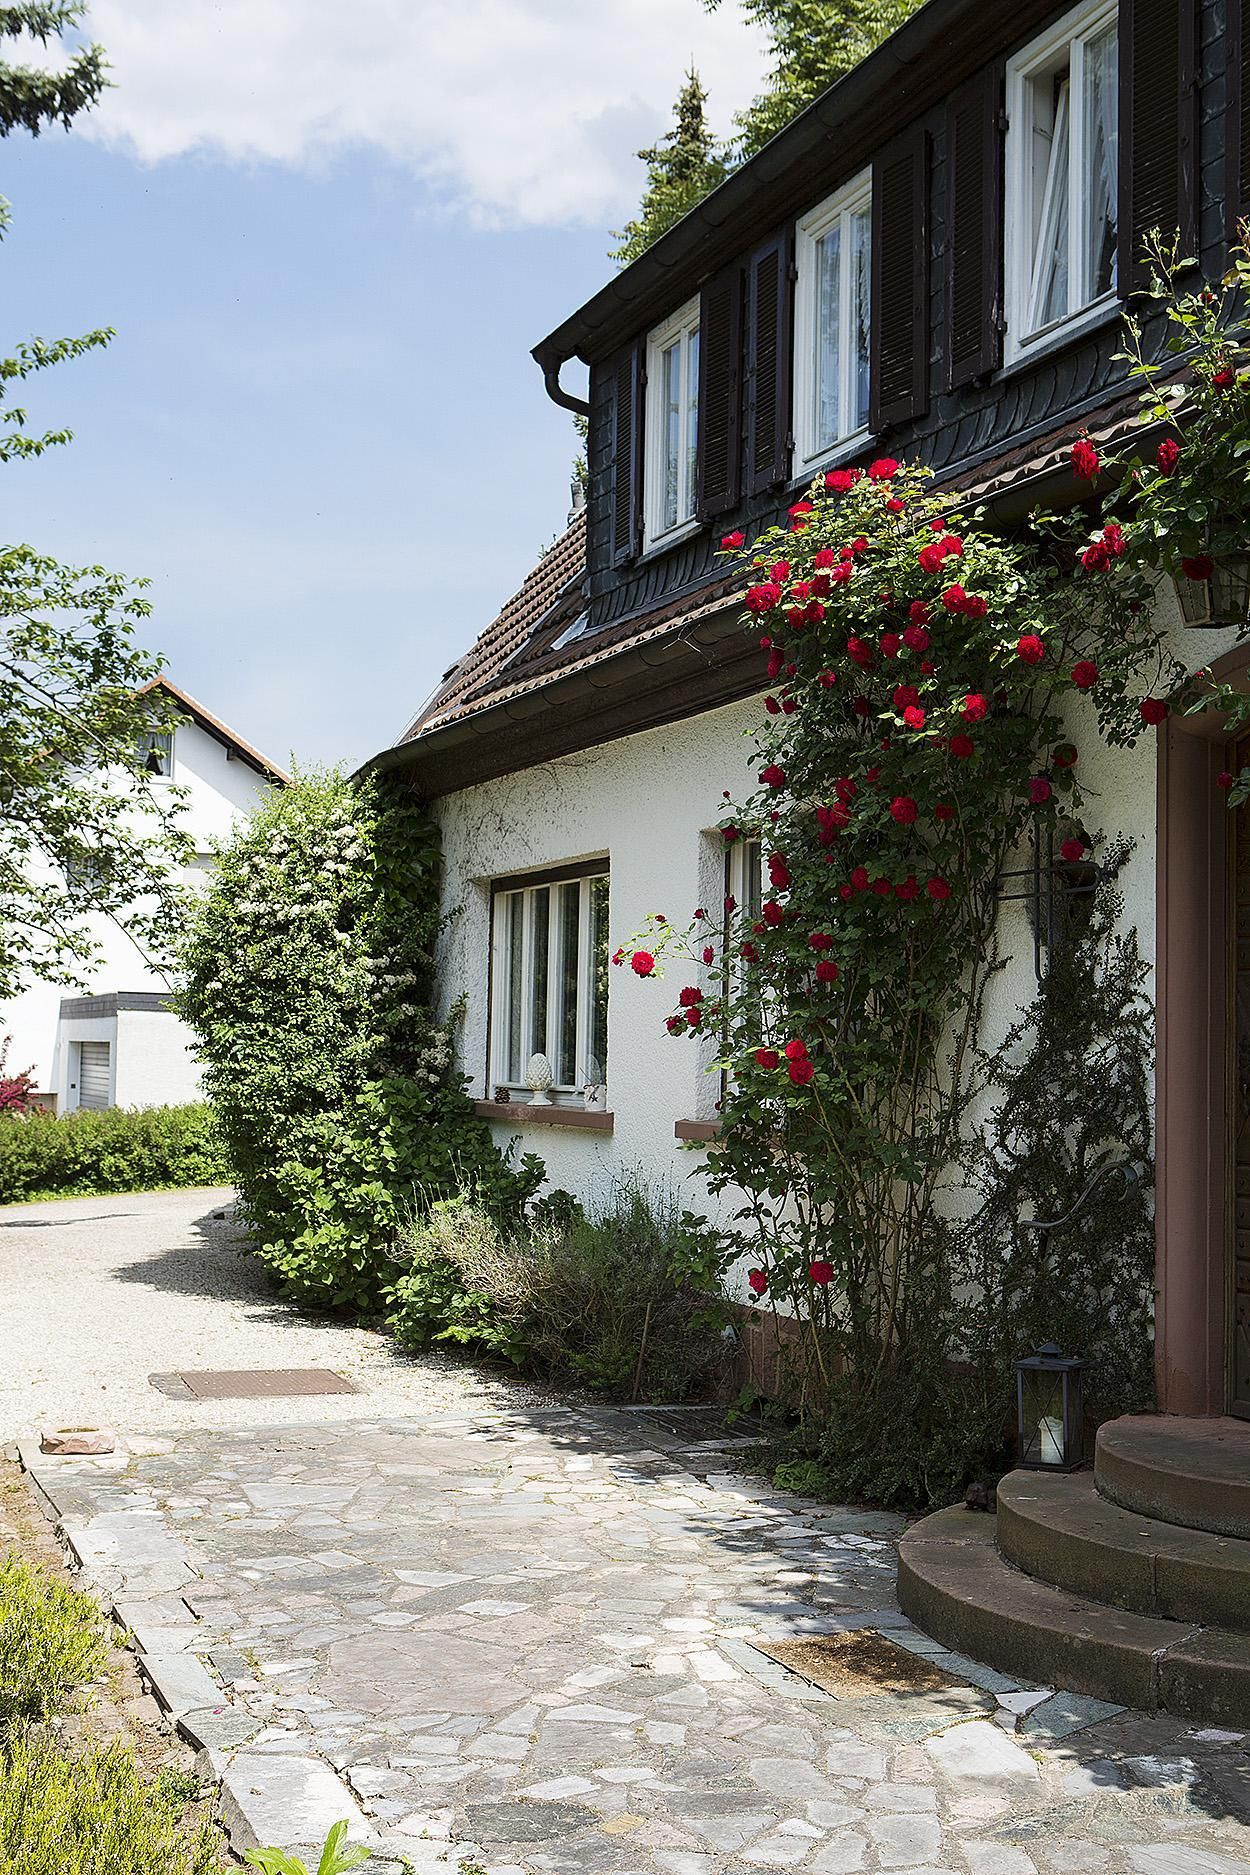 Garden Visit An Enchanted Summerhouse in the German